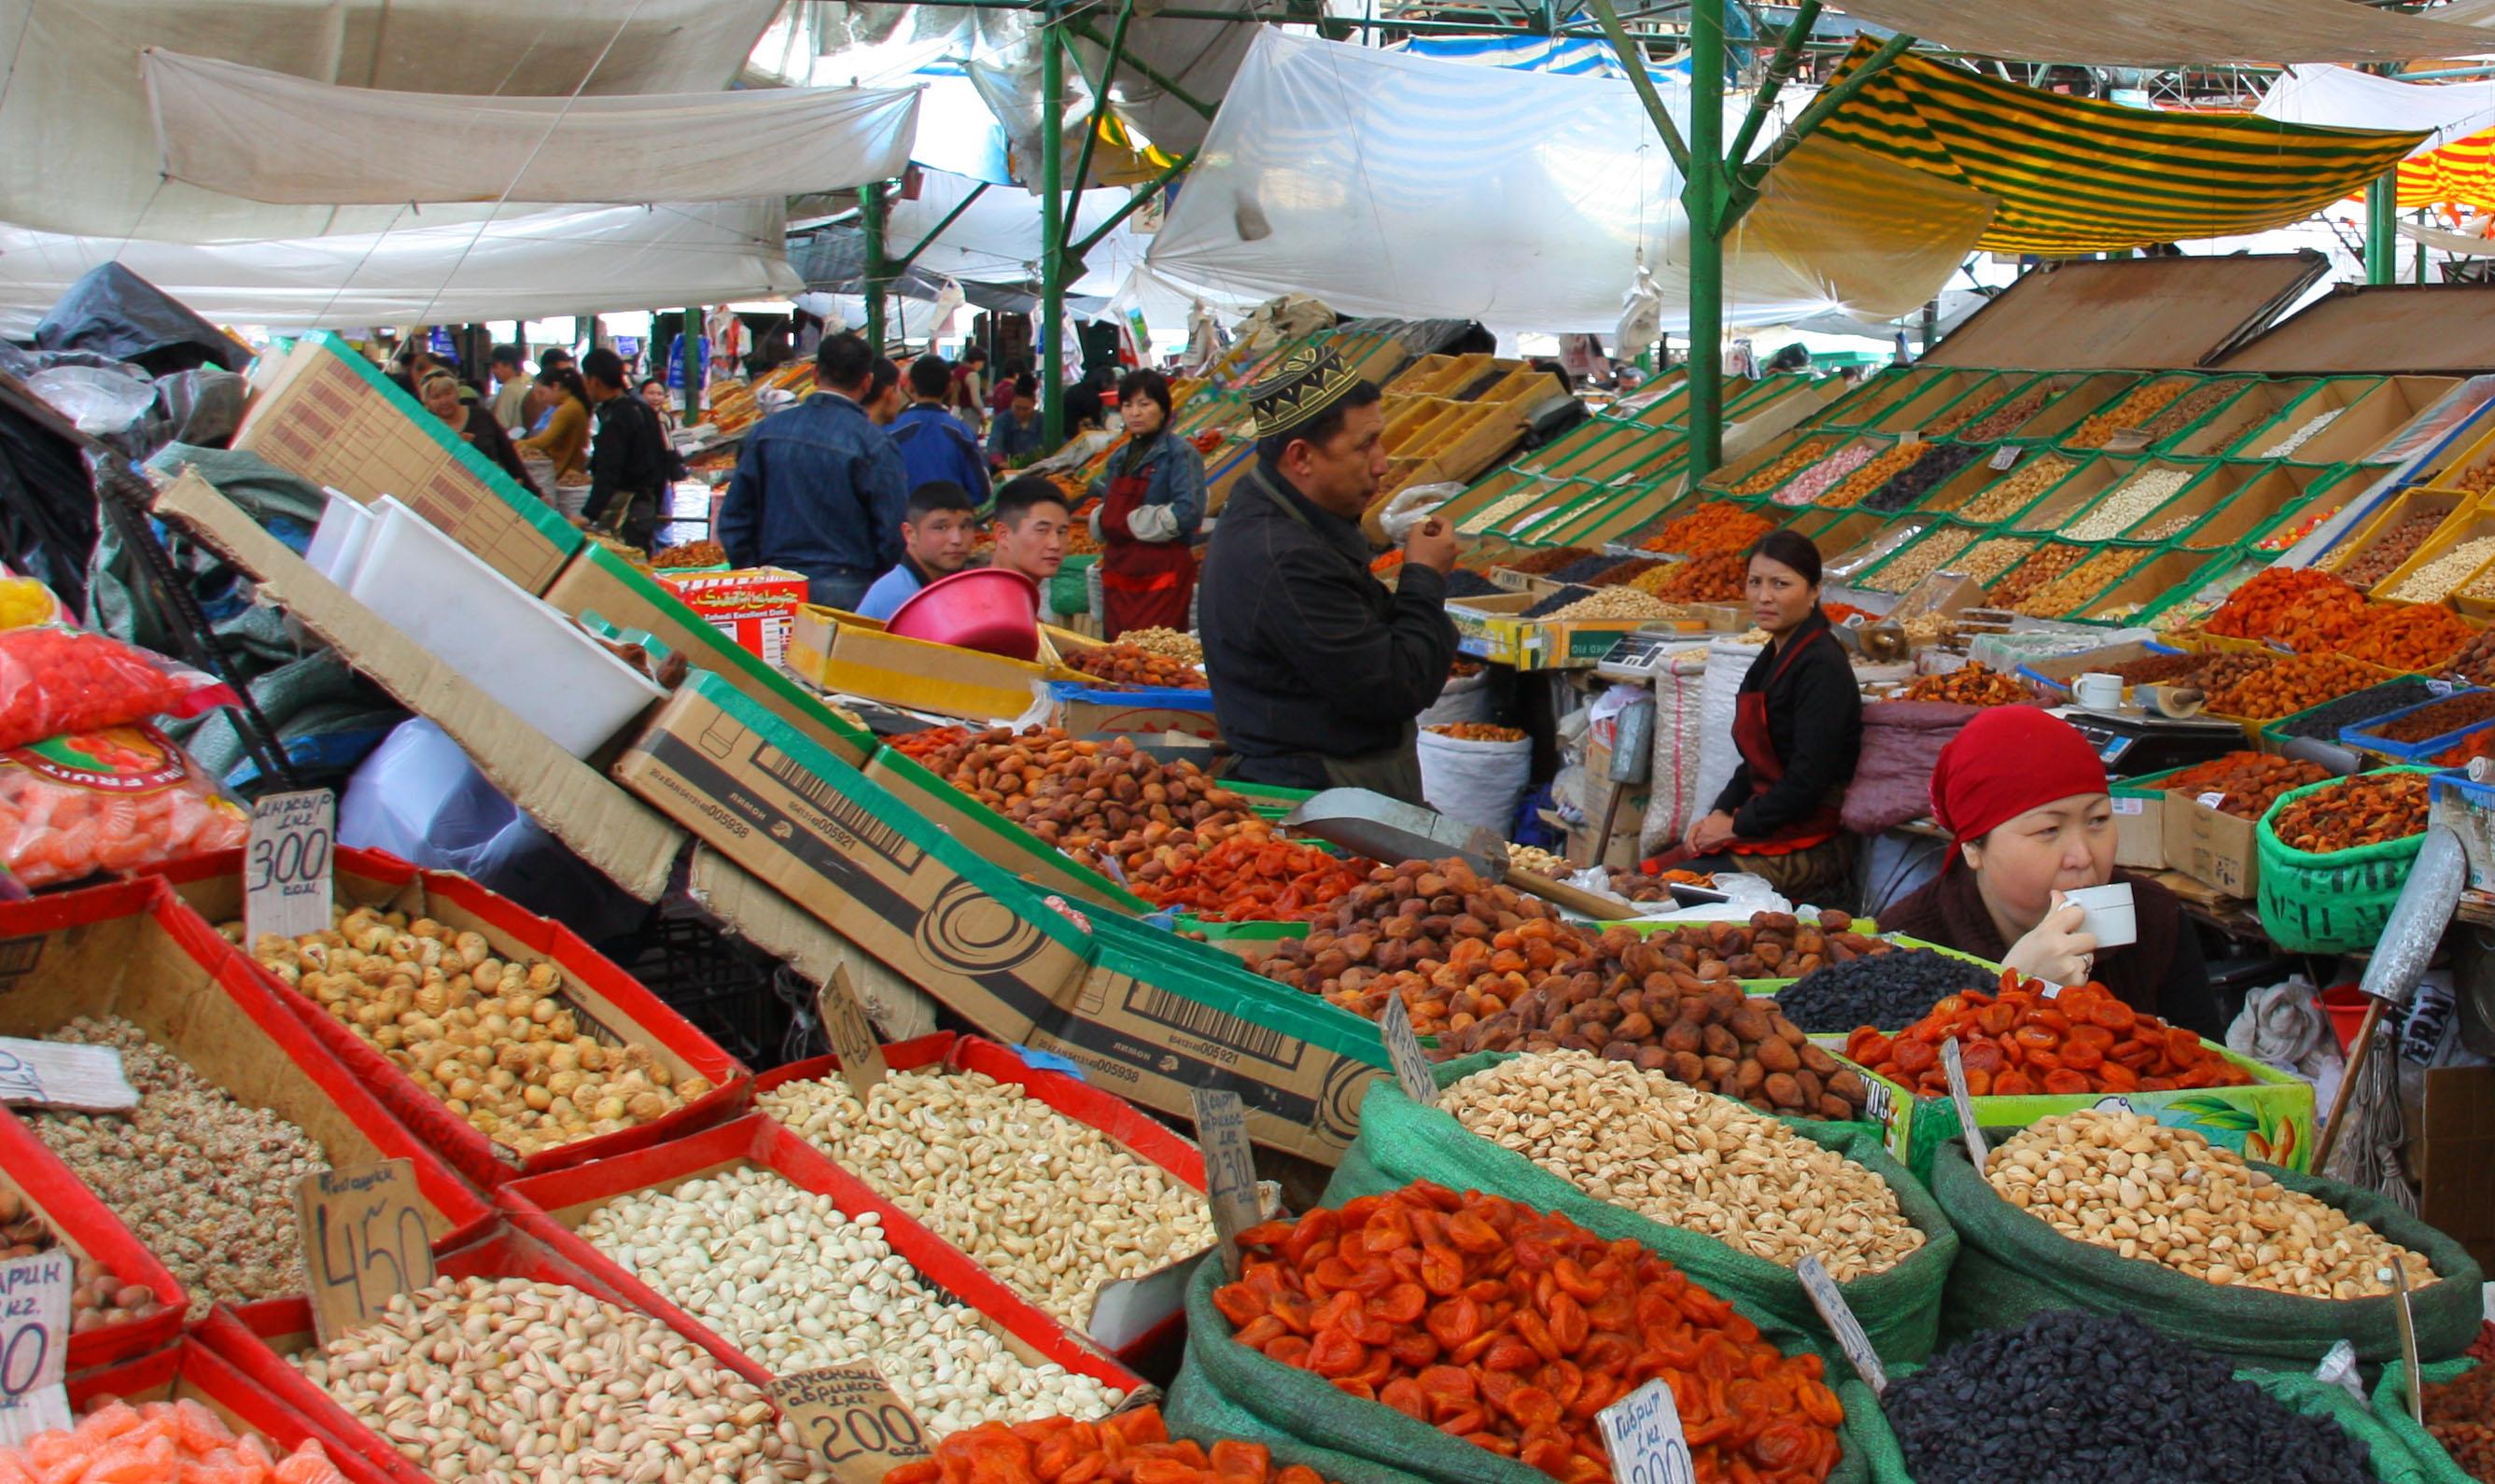 Economy of Kyrgyzstan - Wikipedia